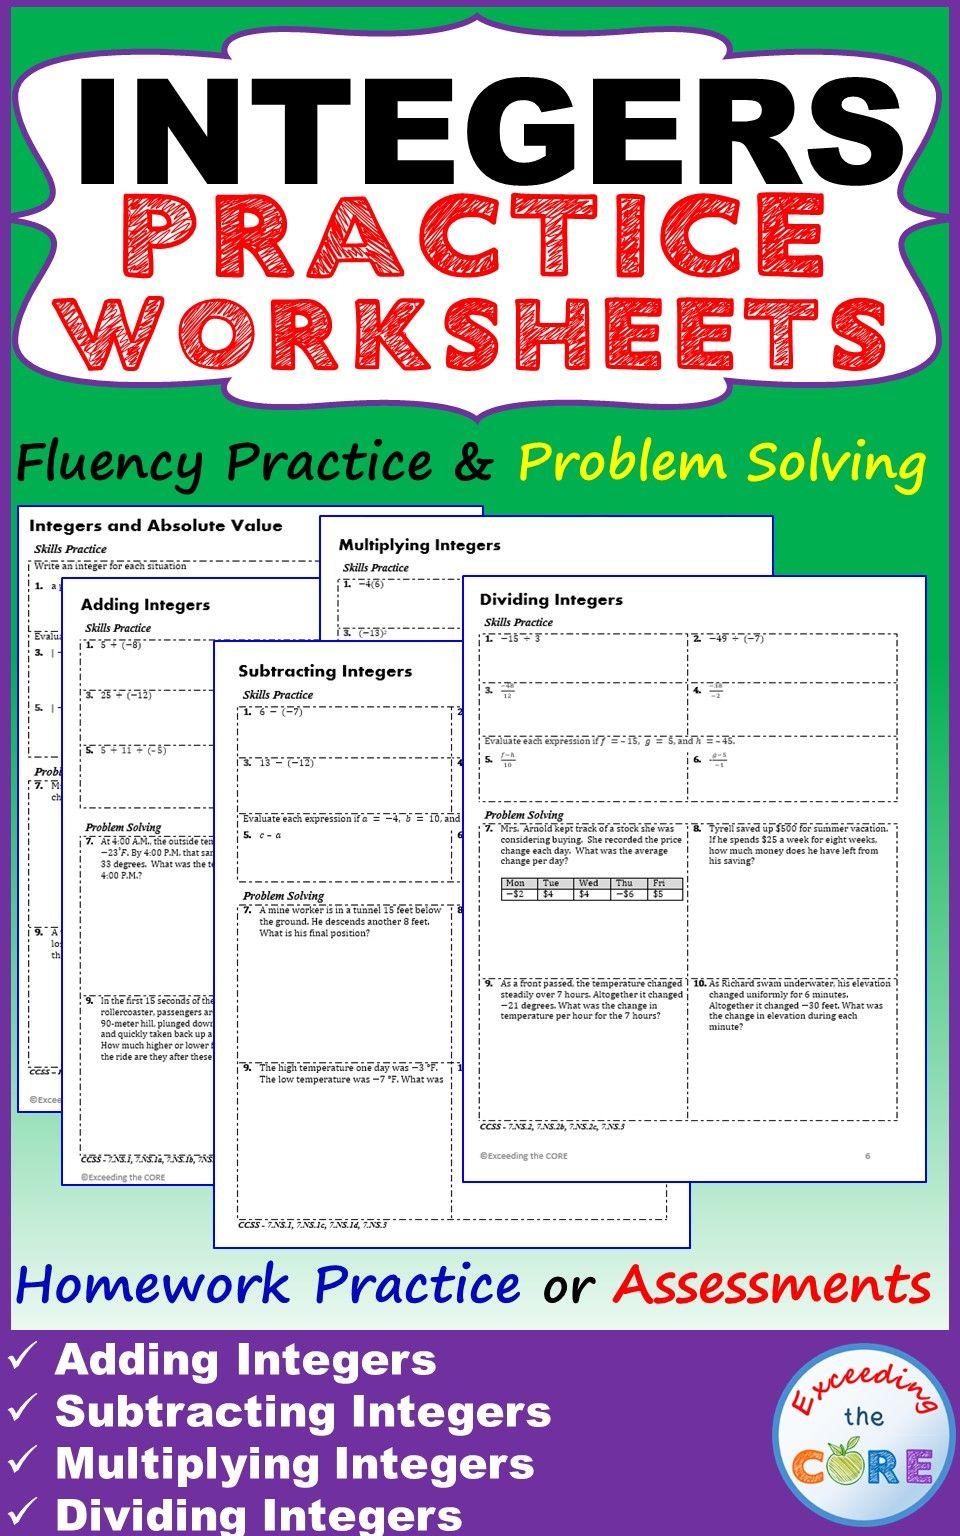 INTEGERS Homework Practice Worksheets - Skills Practice with Word Problems  ~ 5 INTEGER practice worksheets (50 qu…   Integers word problems [ 1536 x 960 Pixel ]